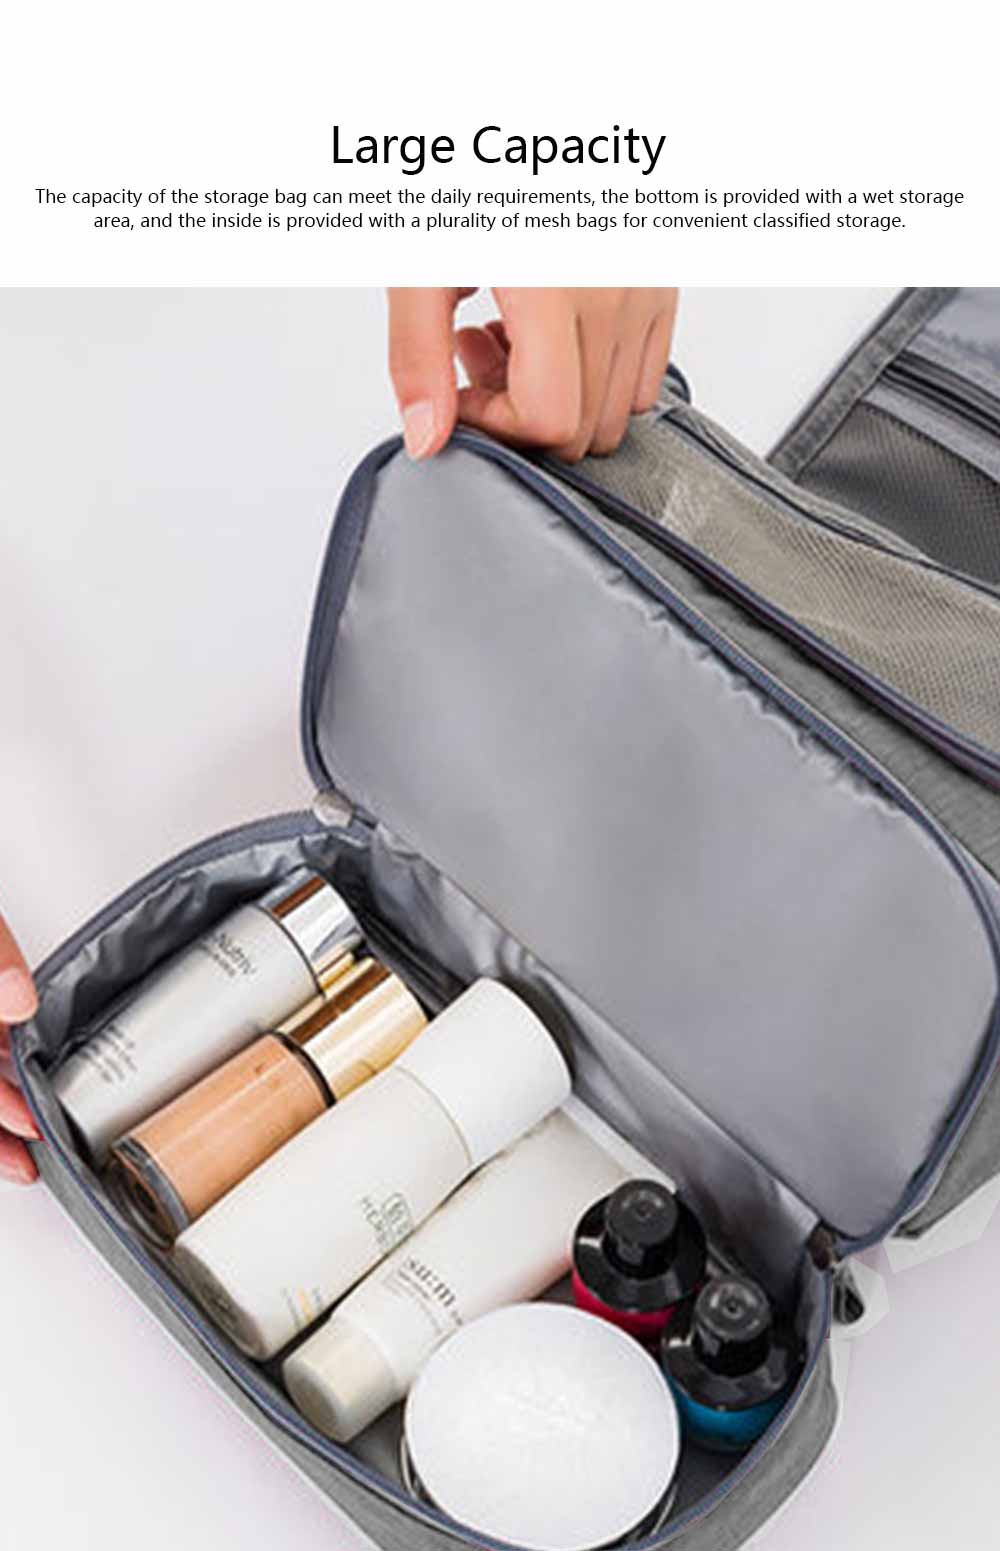 Storage Bag Dry Wet Depart Wash Bag Large Capacity Portable Waterproof Cosmetic Bag for Travel Business Trip 2